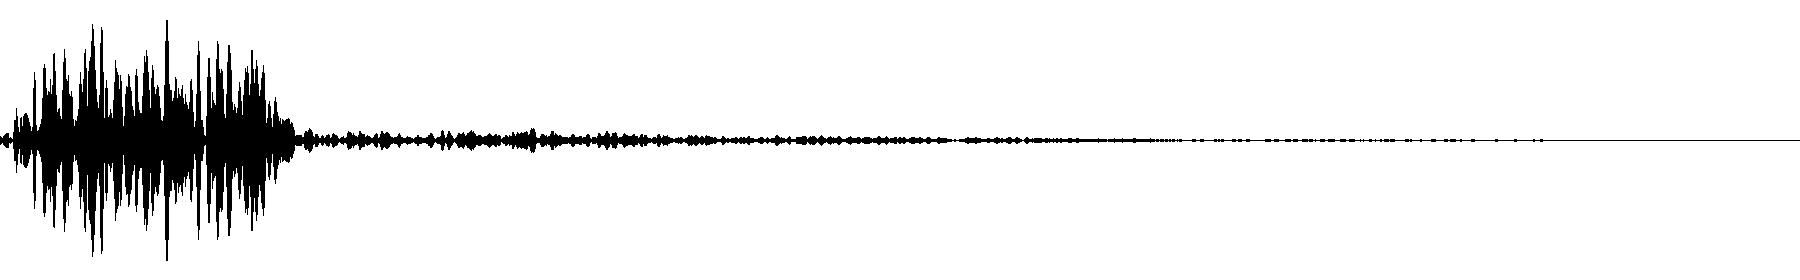 vedh synth cut 226 g7